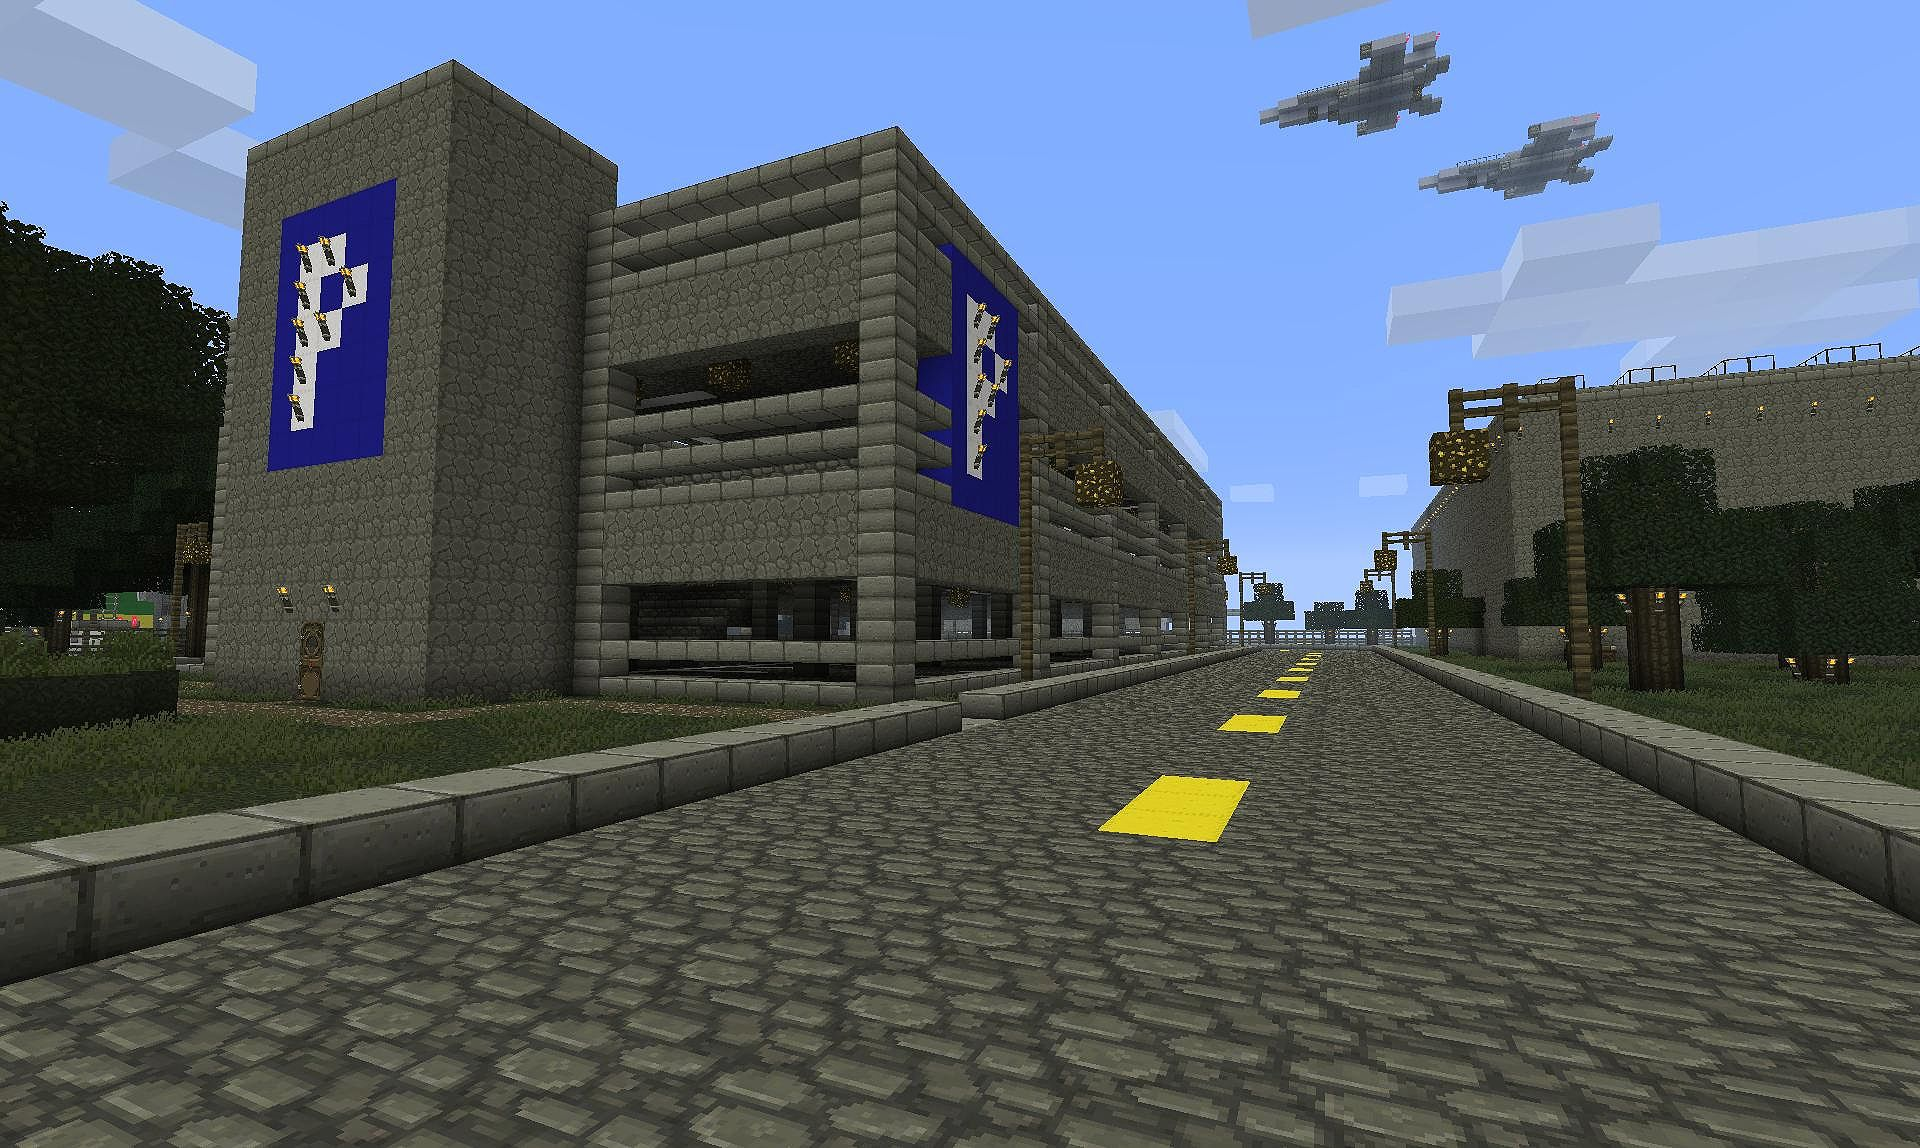 Most Inspiring Wallpaper Minecraft Real Life - 286efe3b7902243a58750f98a90536dc  Pic_92806.jpg